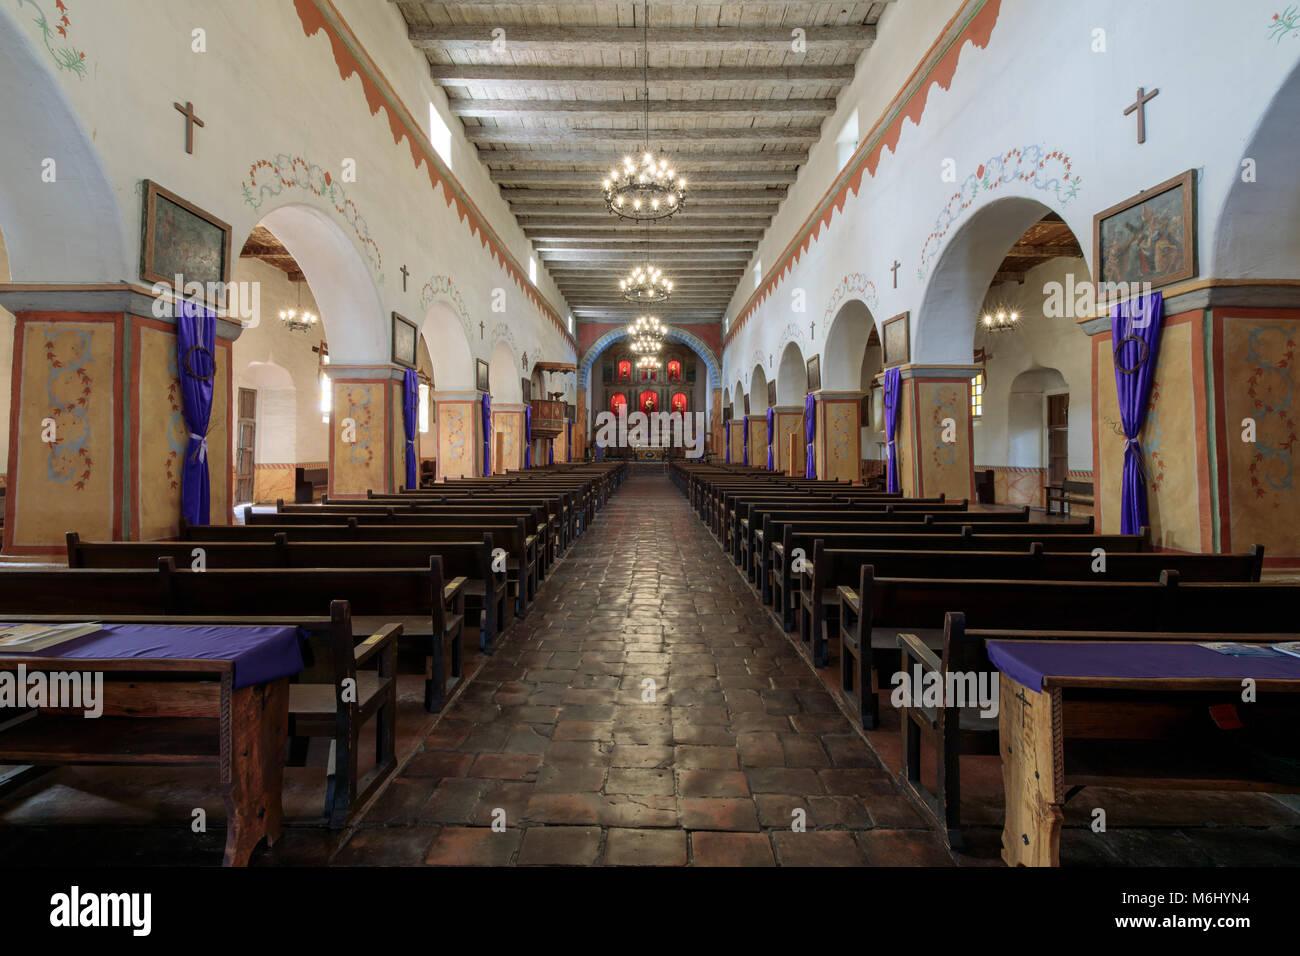 San Juan Bautista, California - March 3, 2018: Interior of Church of Old Mission San Juan Bautista Stock Photo